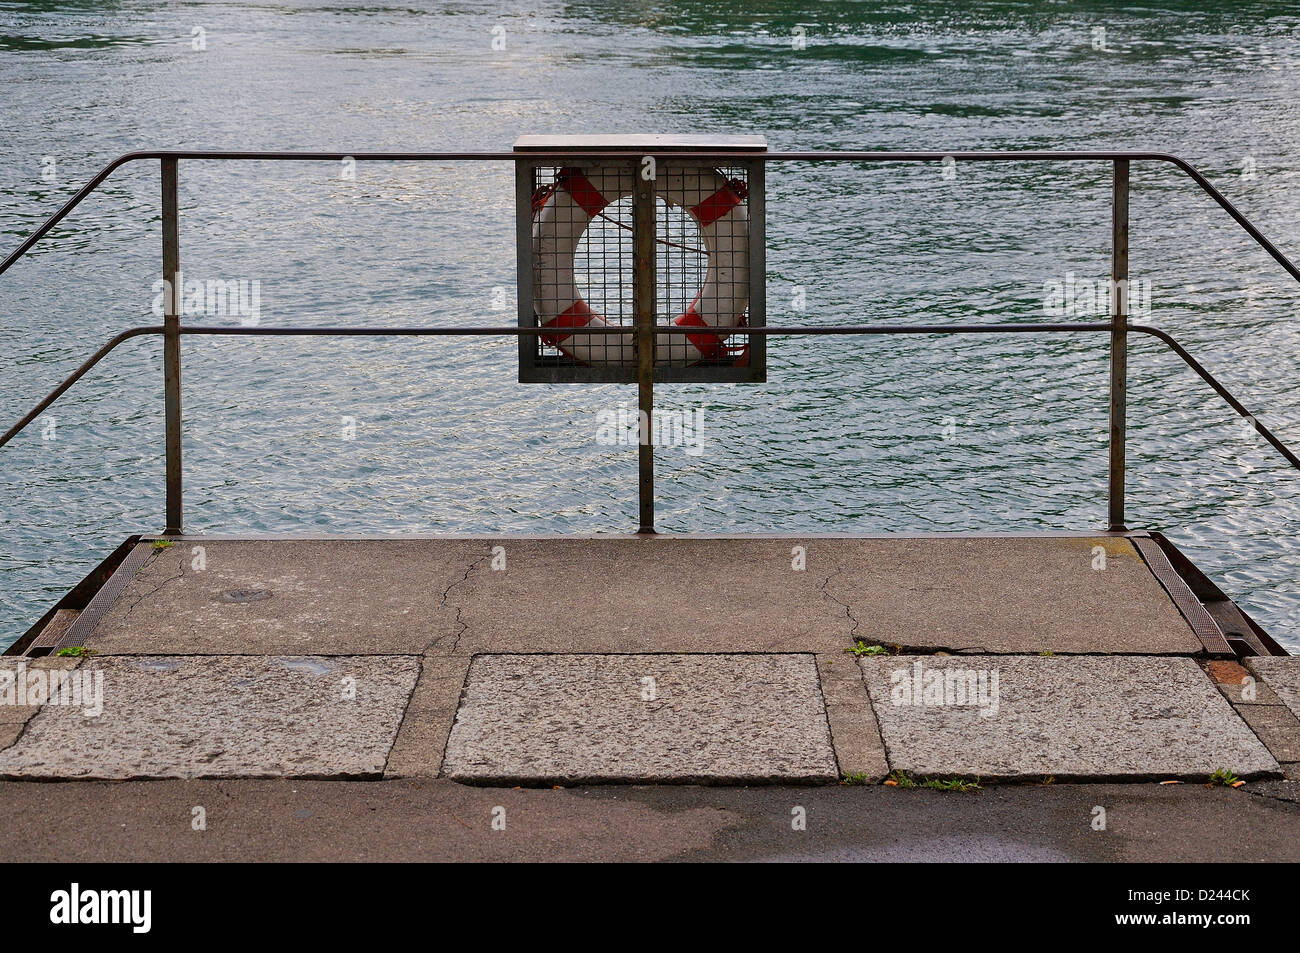 Am Stück Stock Photos & Am Stück Stock Images - Alamy